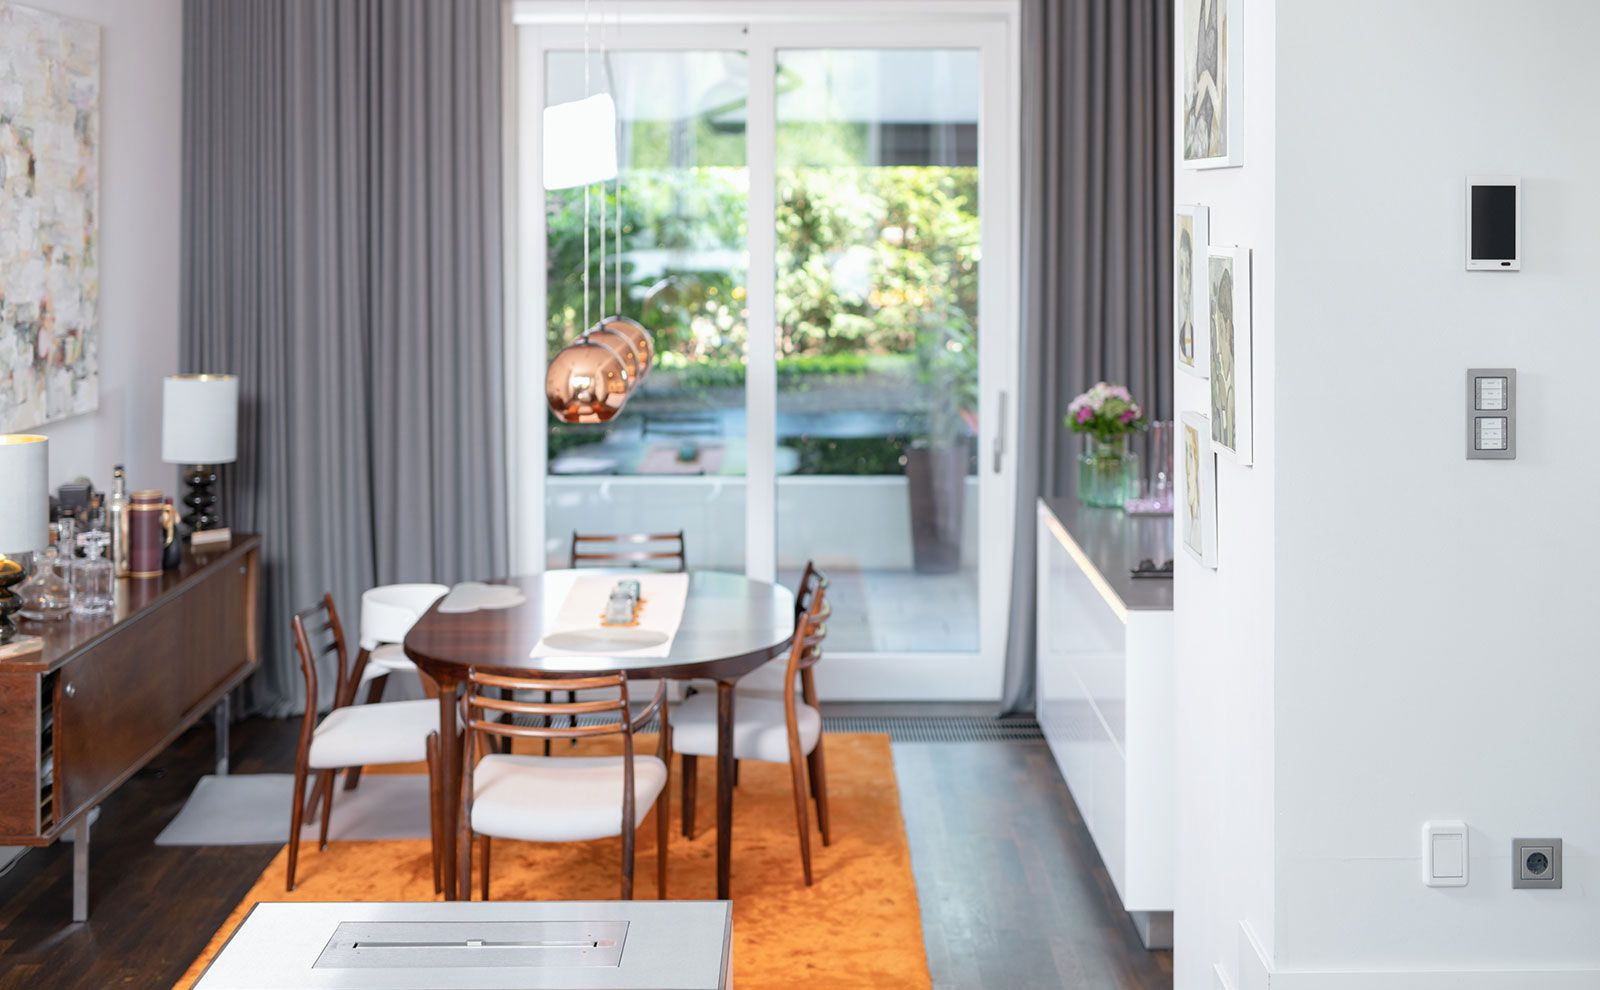 referenz-berliner-smart-home-gira-wohnzimmer-gira-website_19887_1574775650.jpg